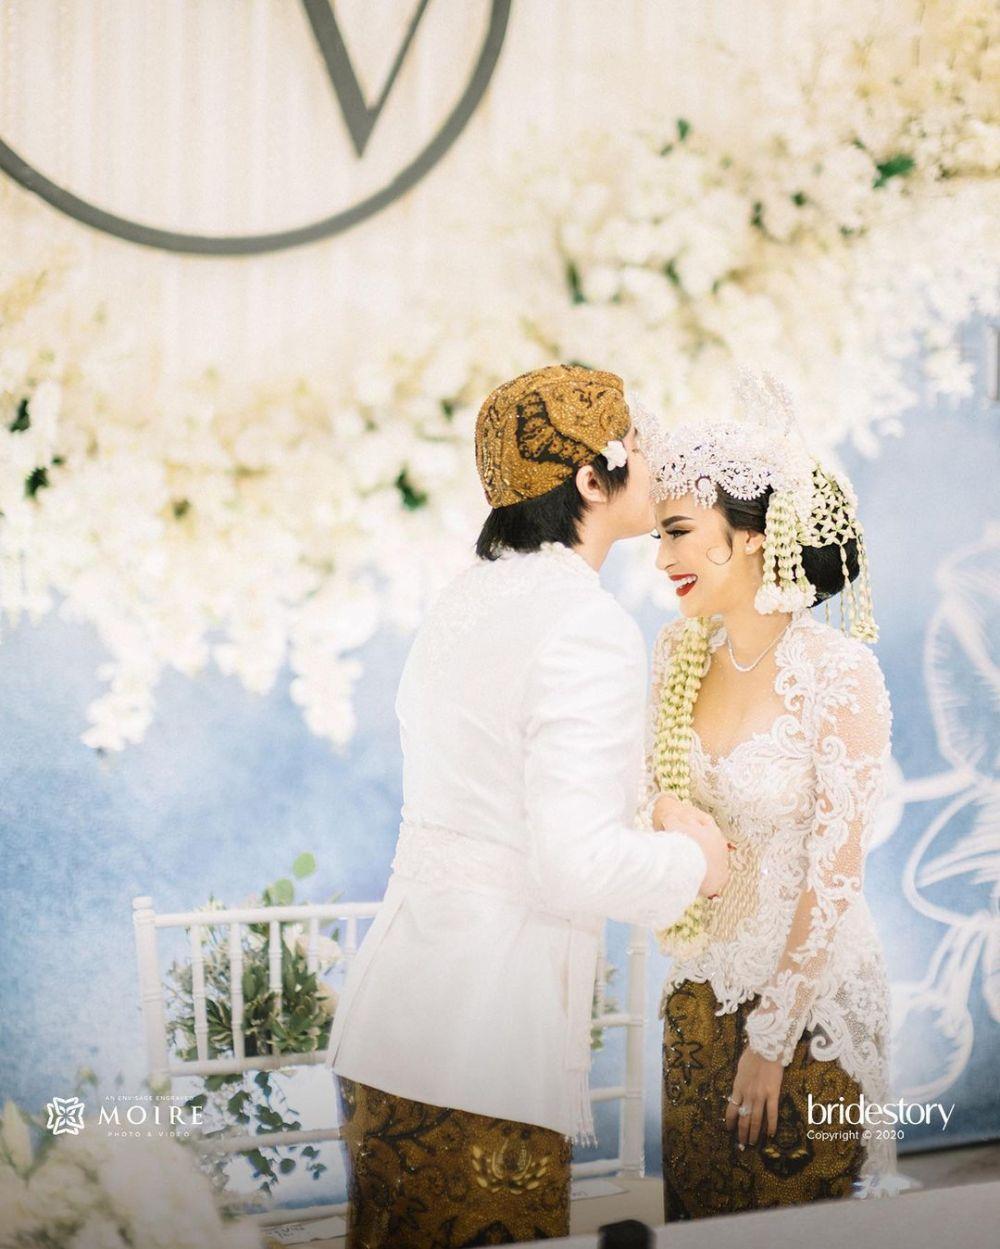 Pernikahan Kevin Aprilio dan Vicy berbagai sumber